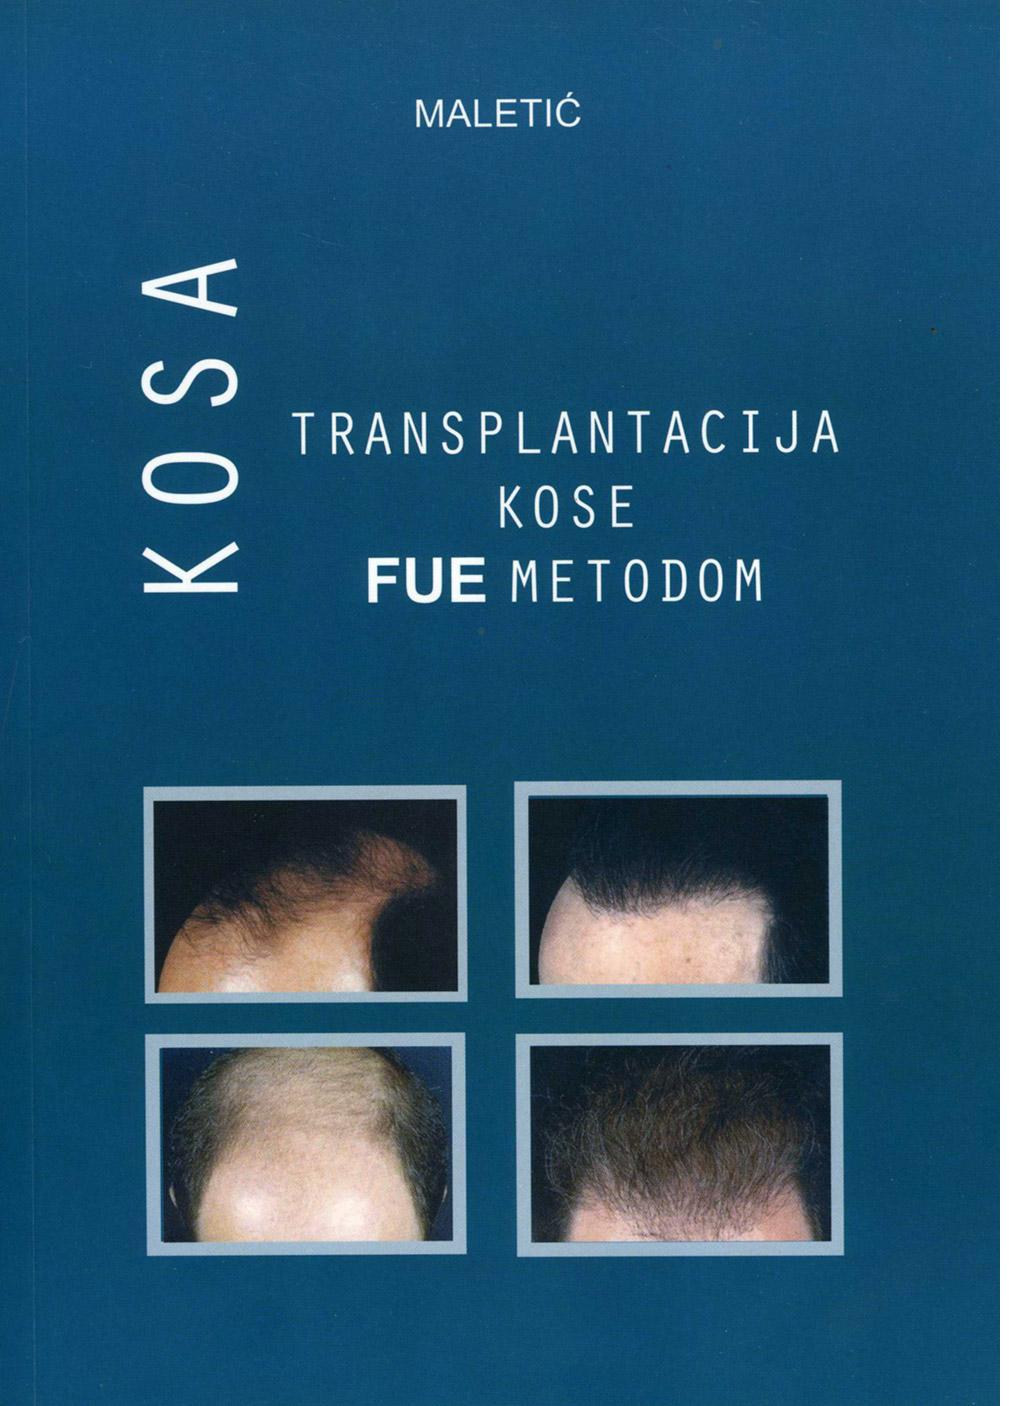 Transplantacija kose FUE metodom - Poliklinika Maletić